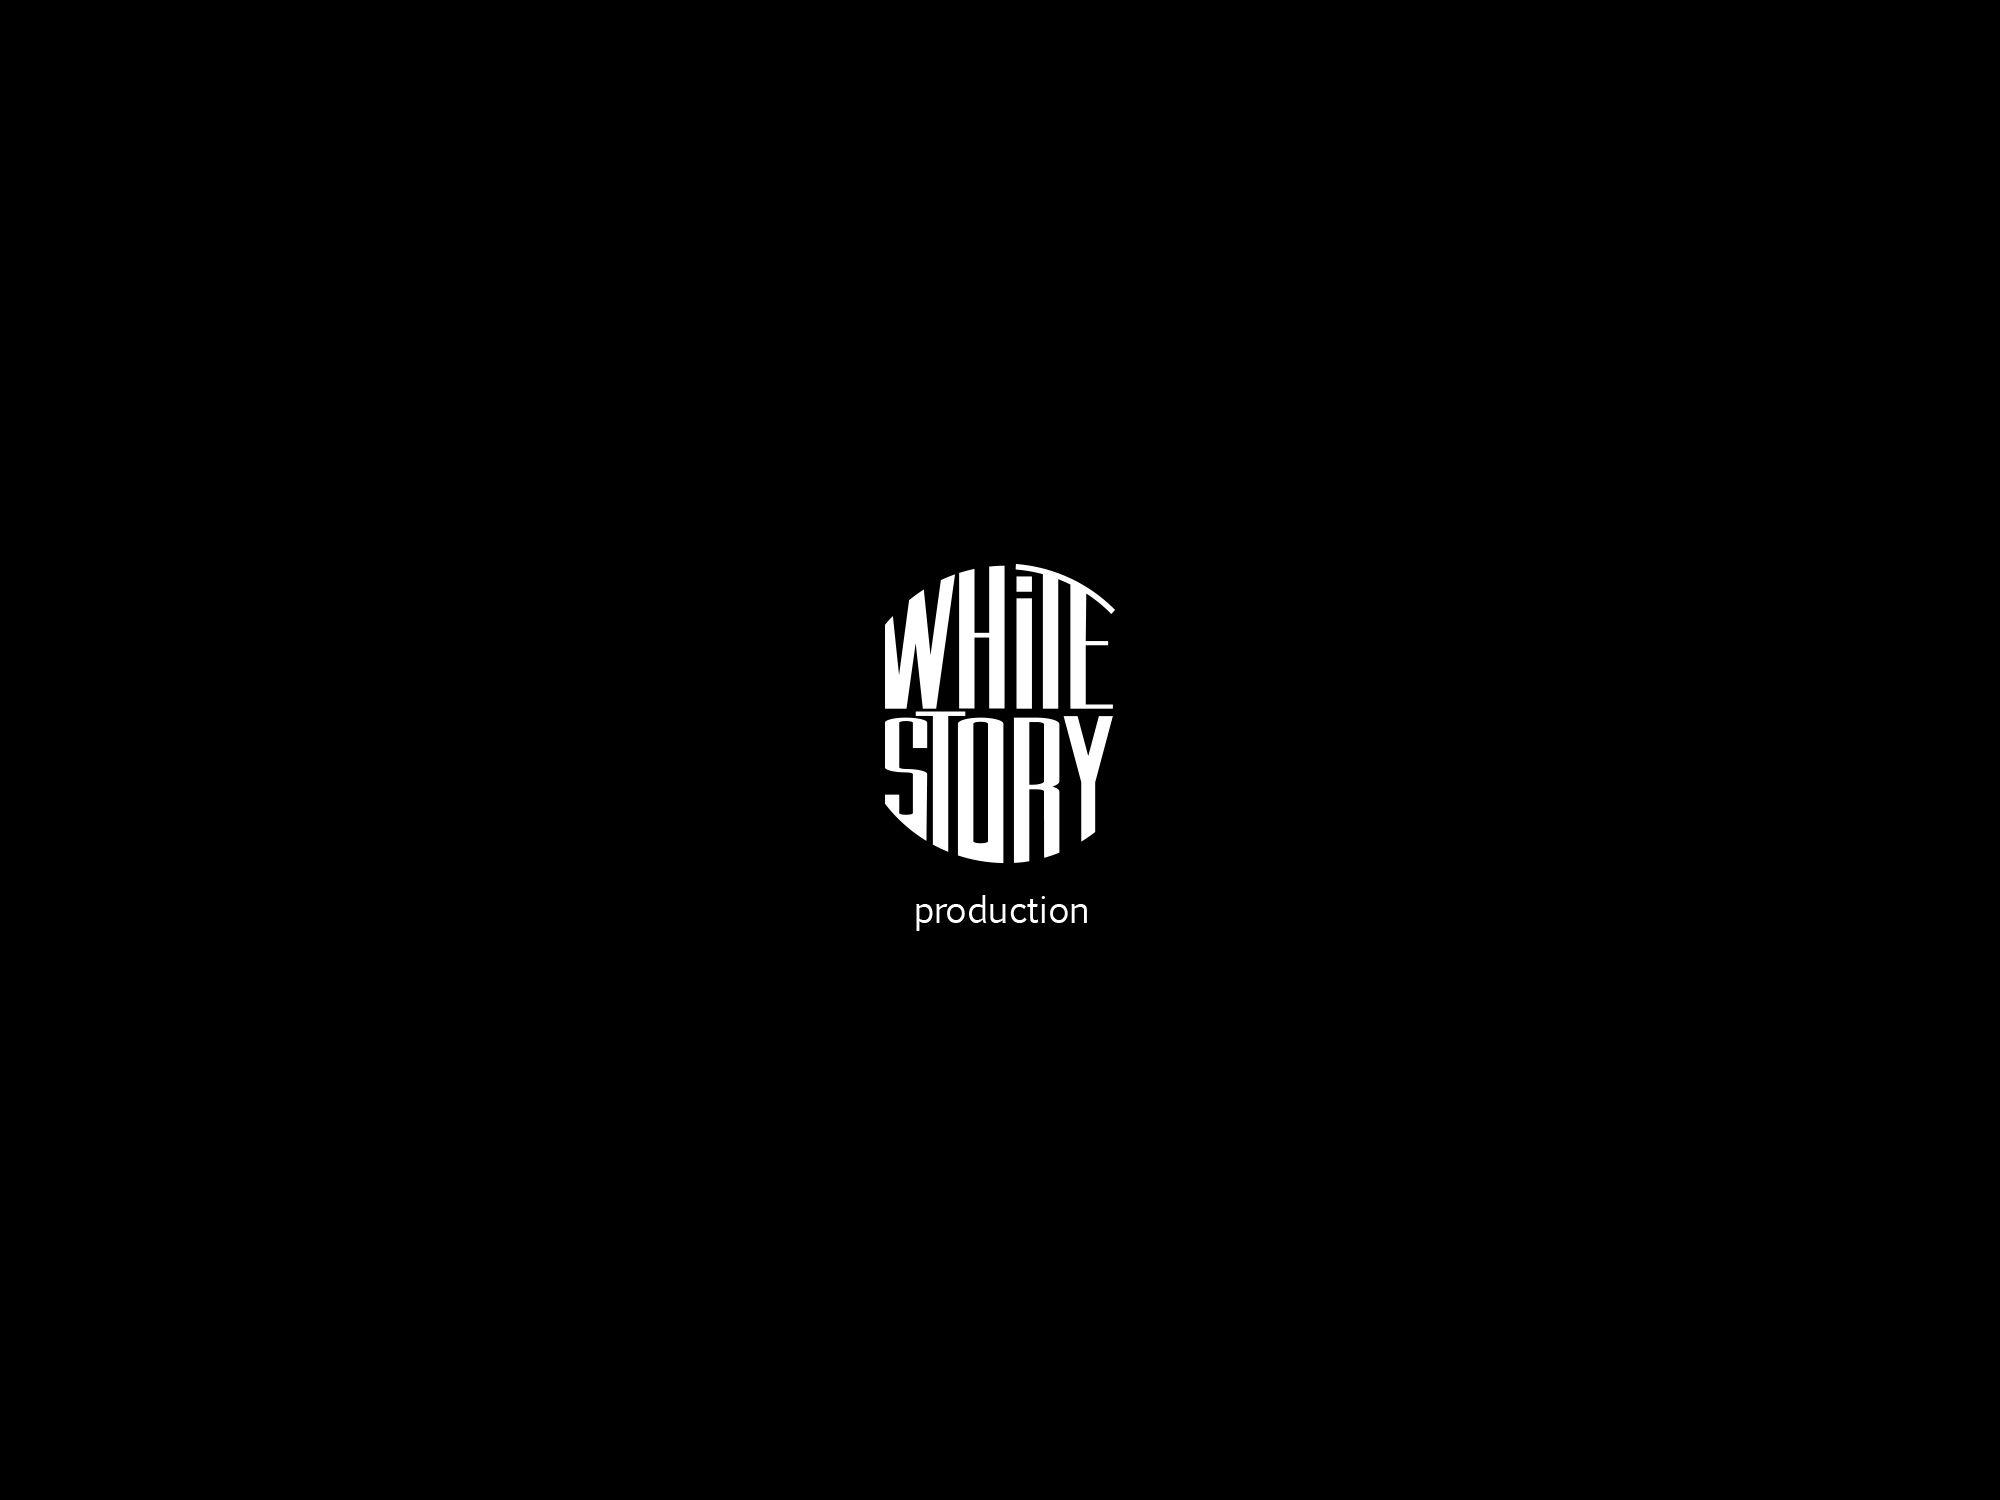 Логотип для Логотип для Фото и Видео продакшена - дизайнер outsiderr